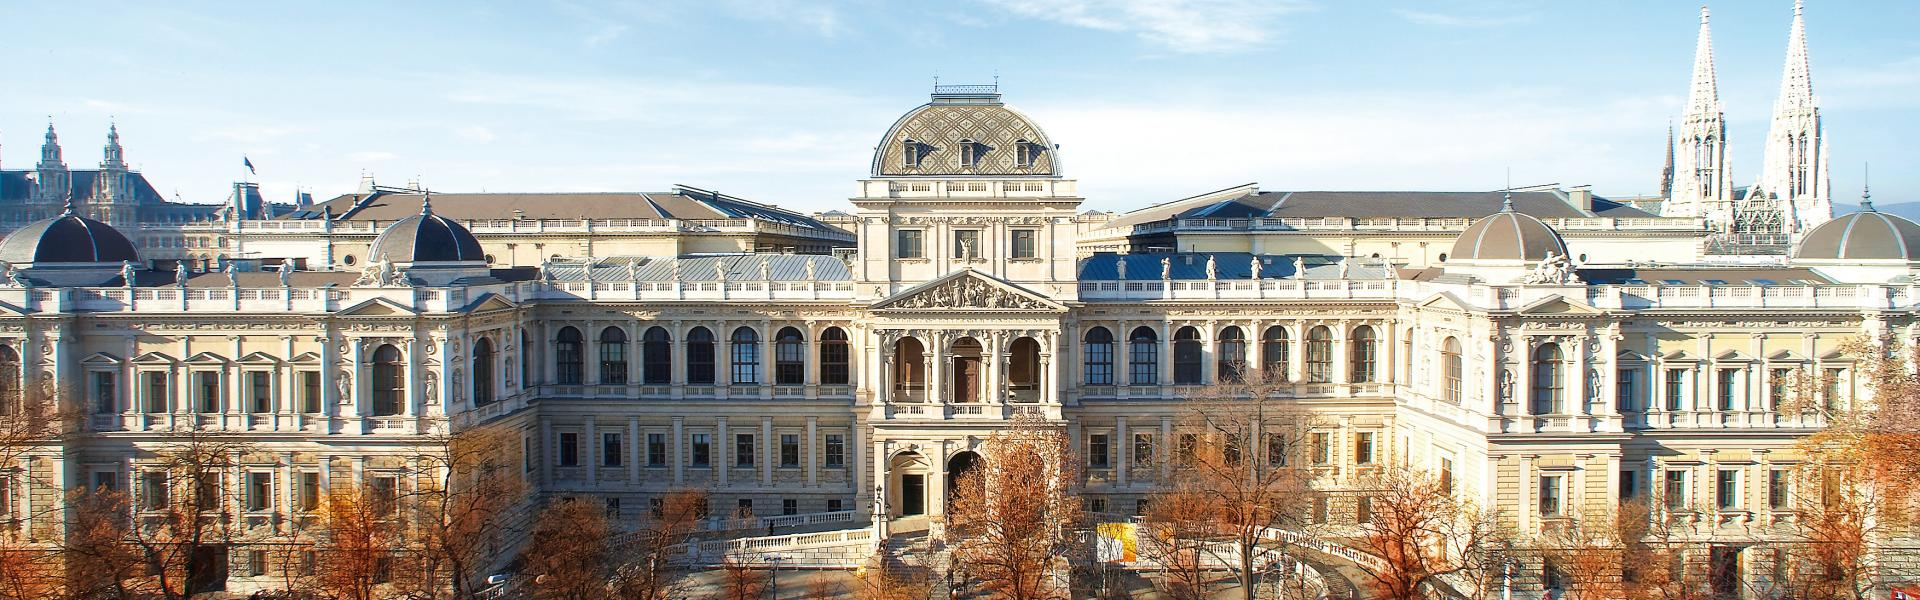 Universität Wien - Postgraduate Center cover